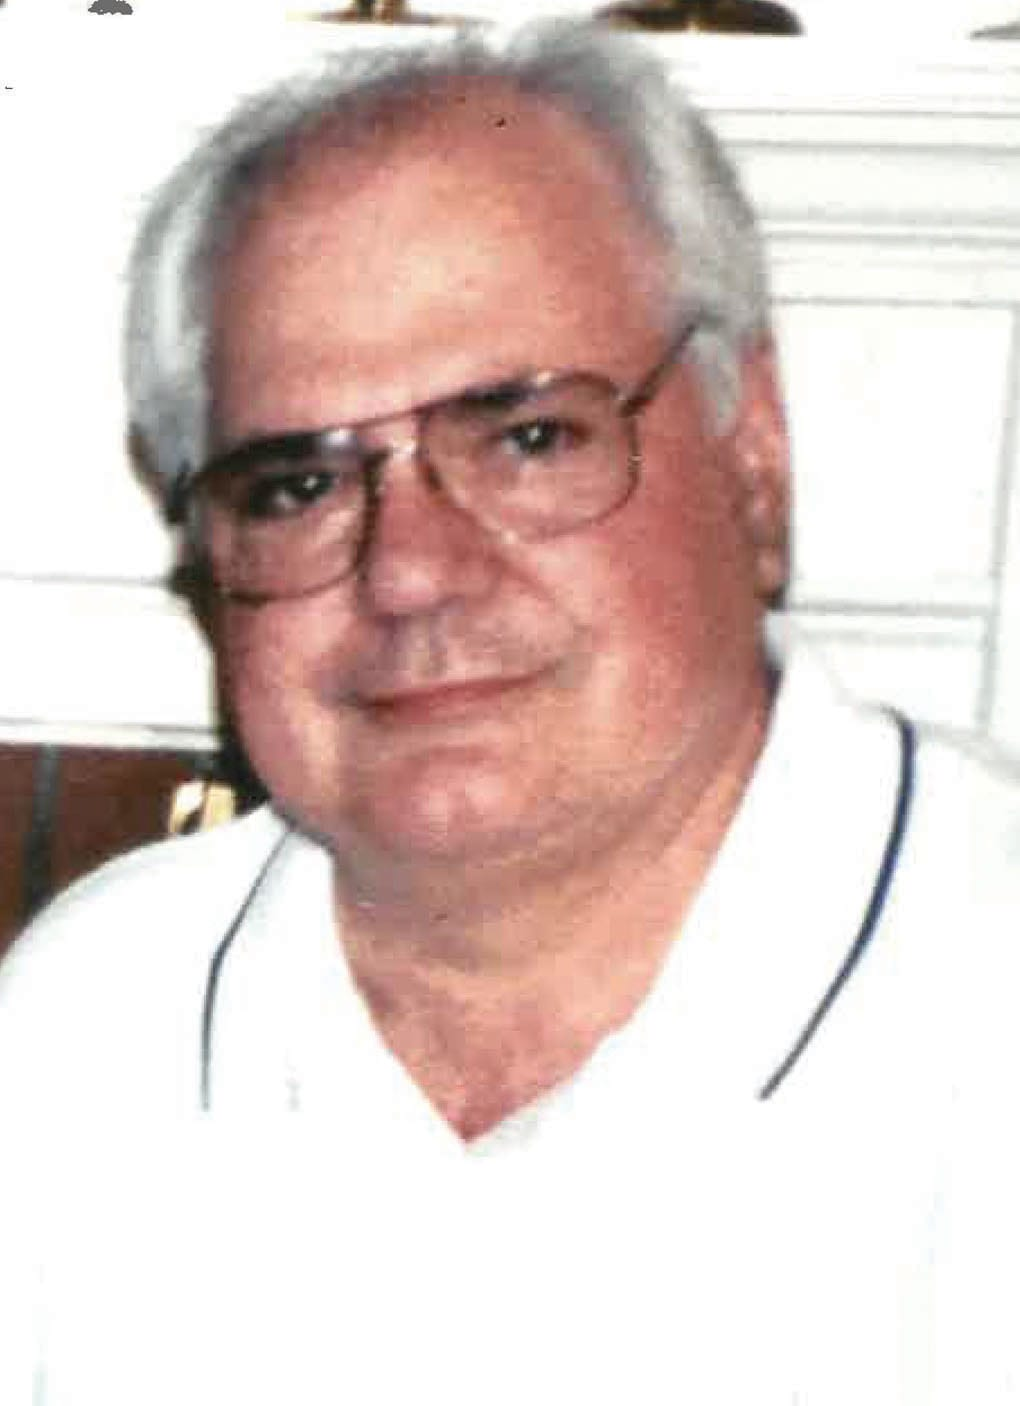 Michael Grandstaff, 77